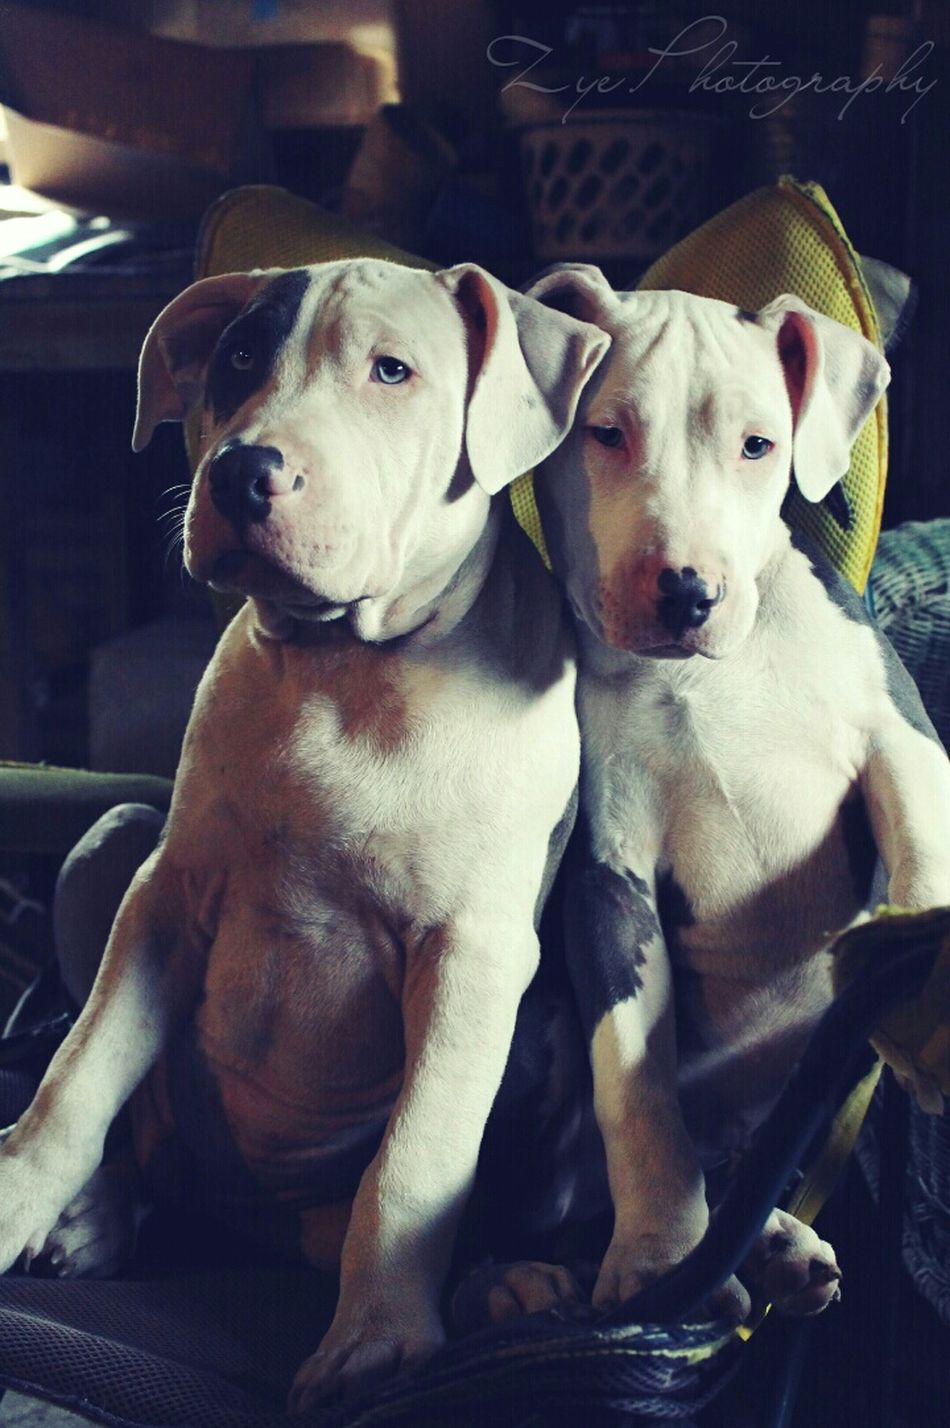 Brother Hood ZyePhotography Pitbullsofinstagram Pitbulls Pitbull♥ Brothers Pitbullpuppies Harlingen Tx Ilovemydogs Canonrebelt3 Taking Photos